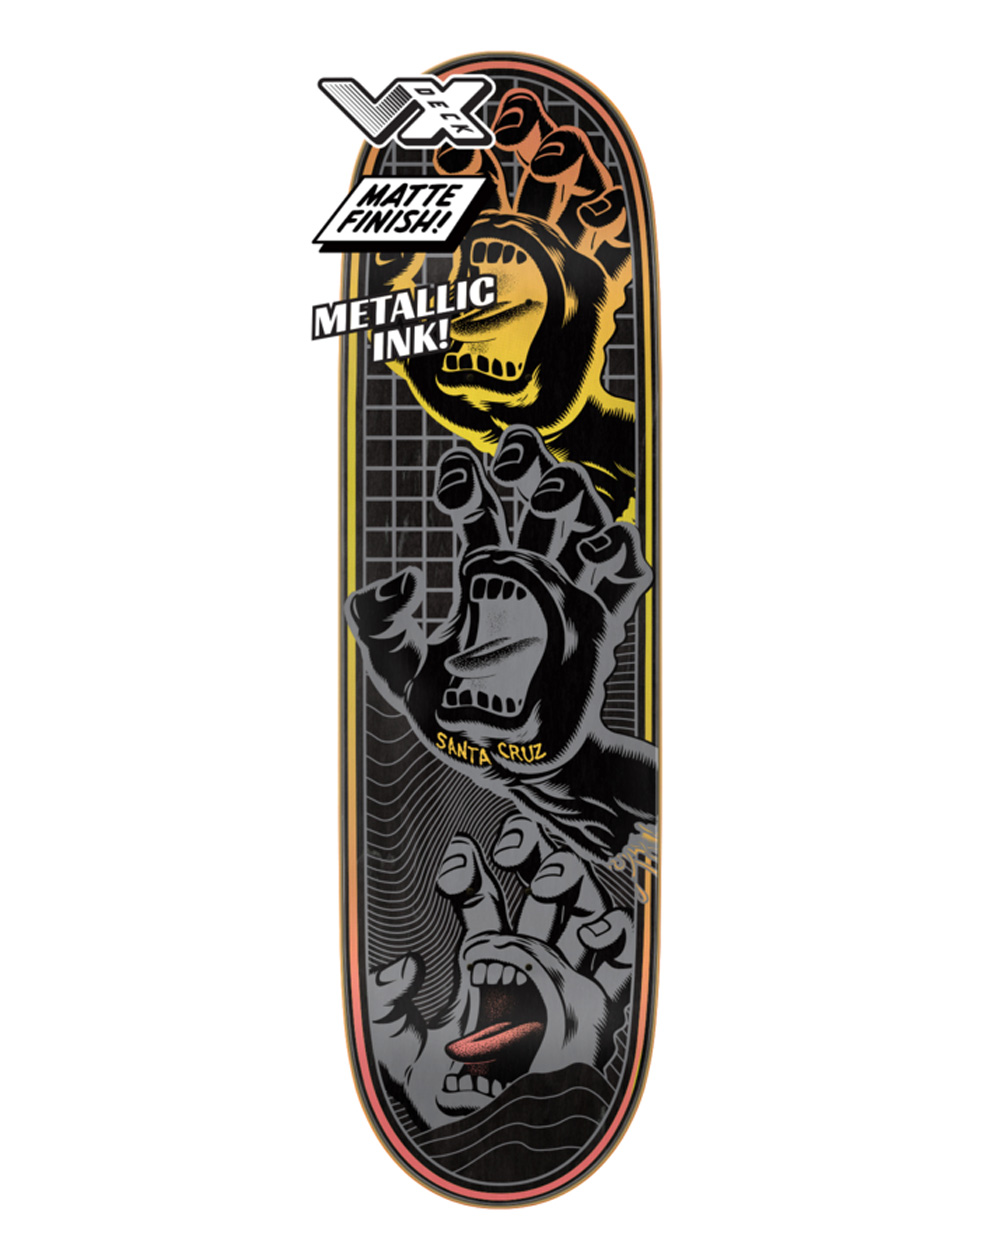 "Santa Cruz Transcend Hands VX 8.8"" Skateboard Deck"